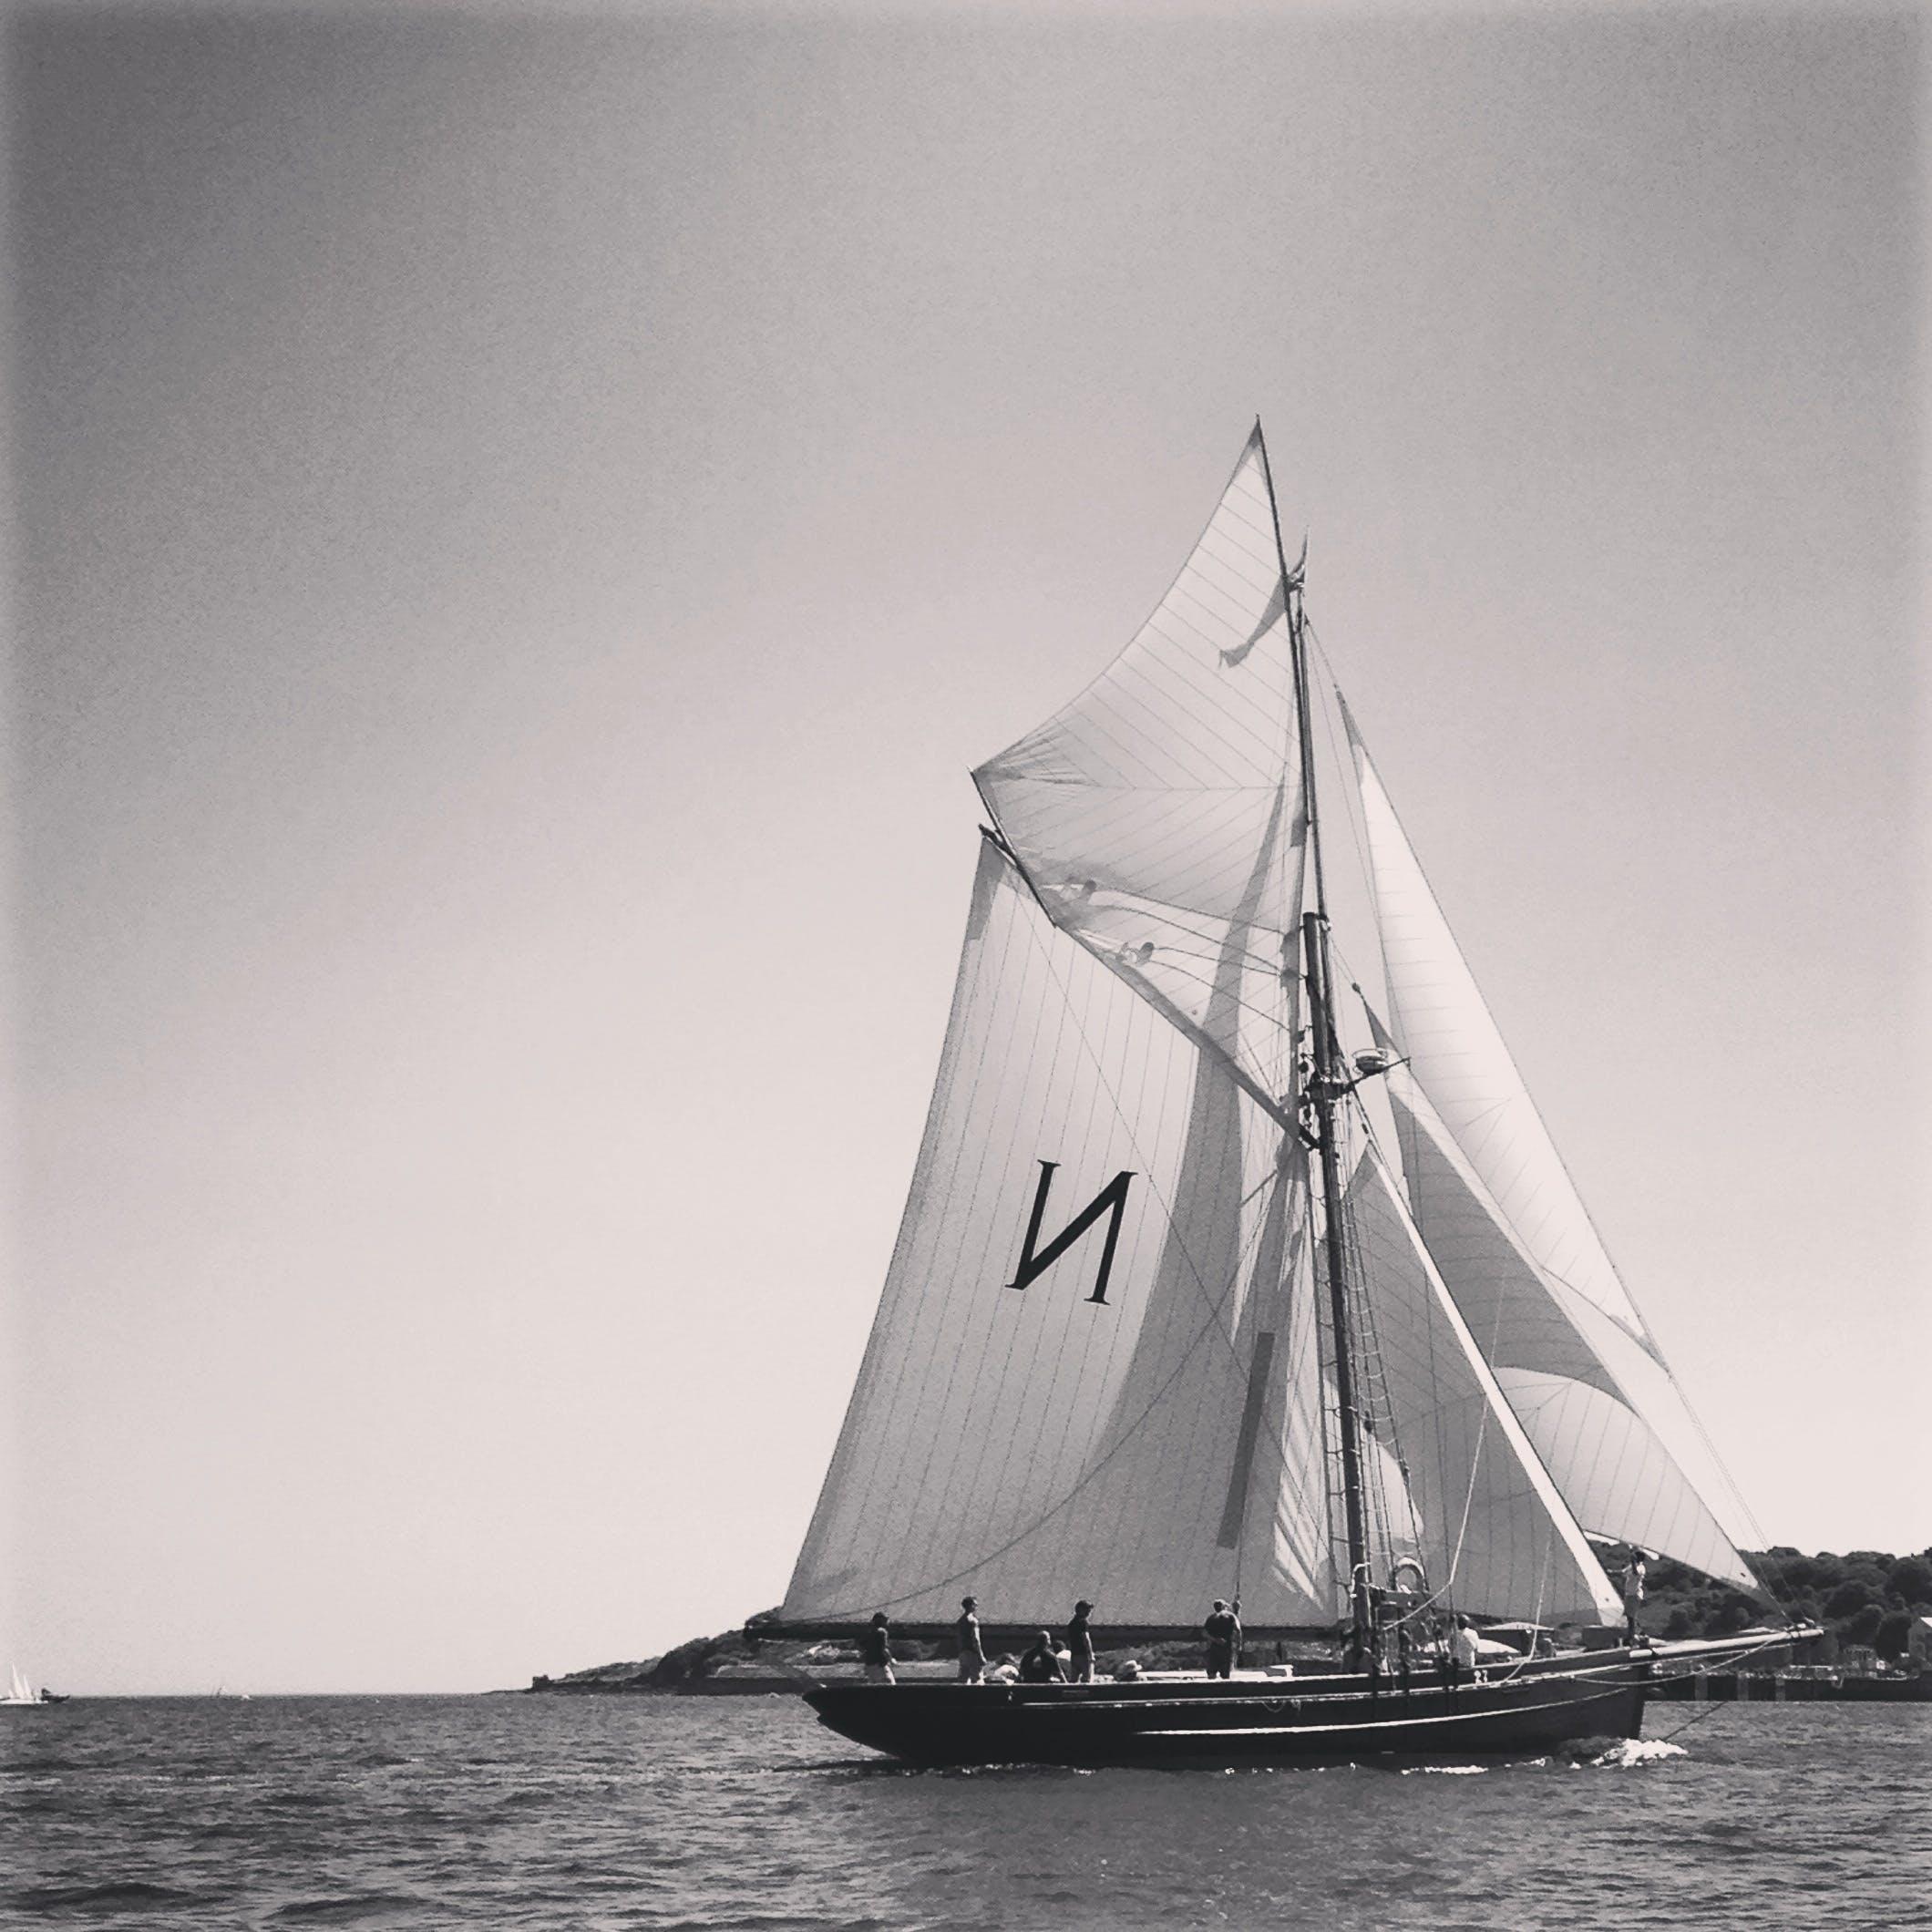 Sail Boat on Sea